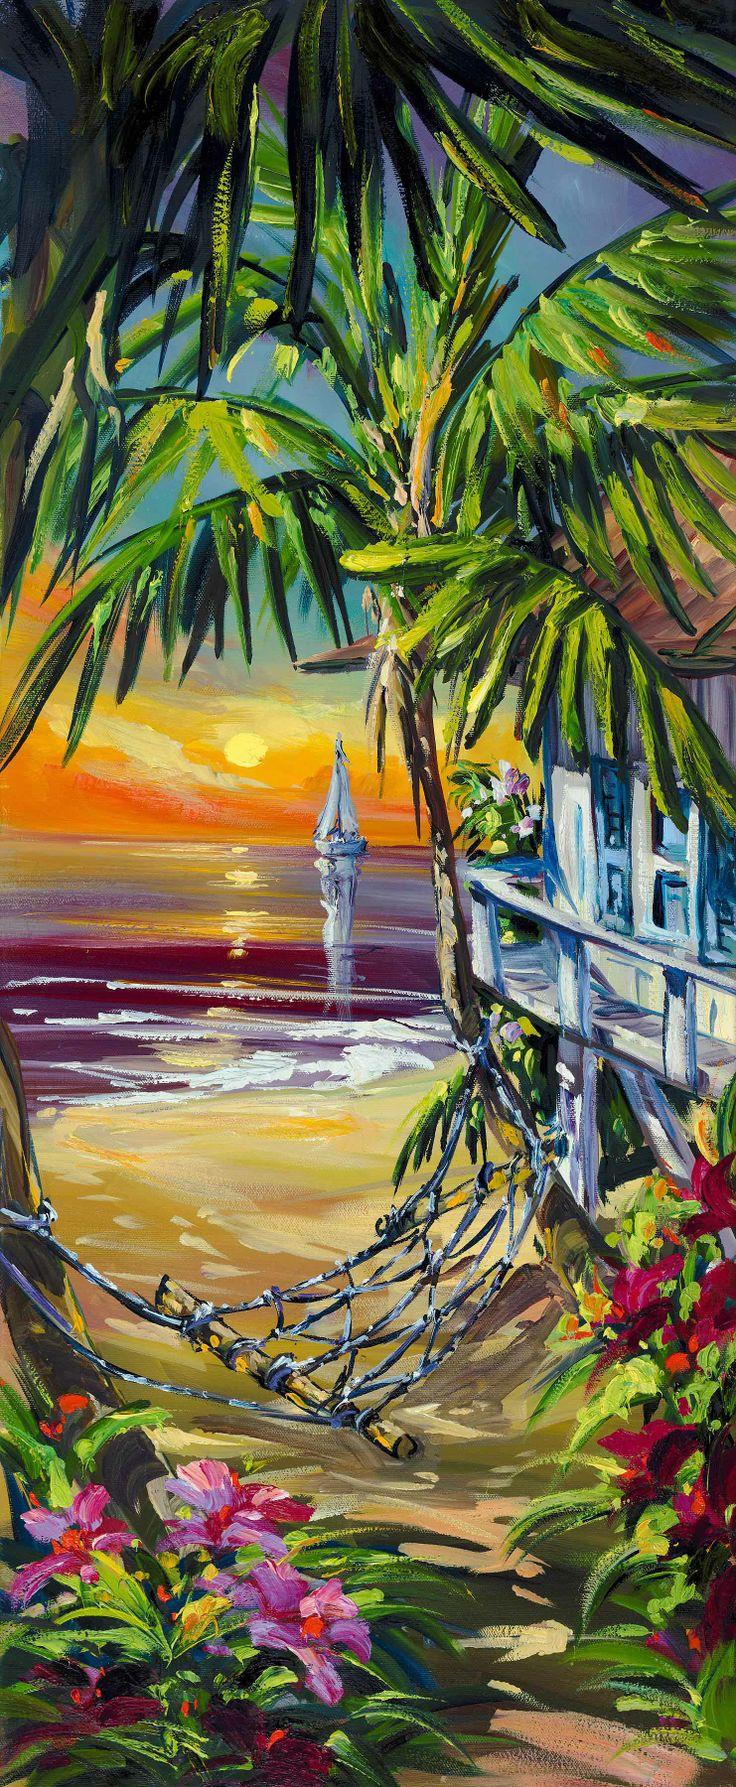 """Sunset Bungalow"", by Steve Barton Size: 14"" x 34"" Medium: Giclee on Canvas - Gallery Wrap Edition: 50  #art #hawaii"